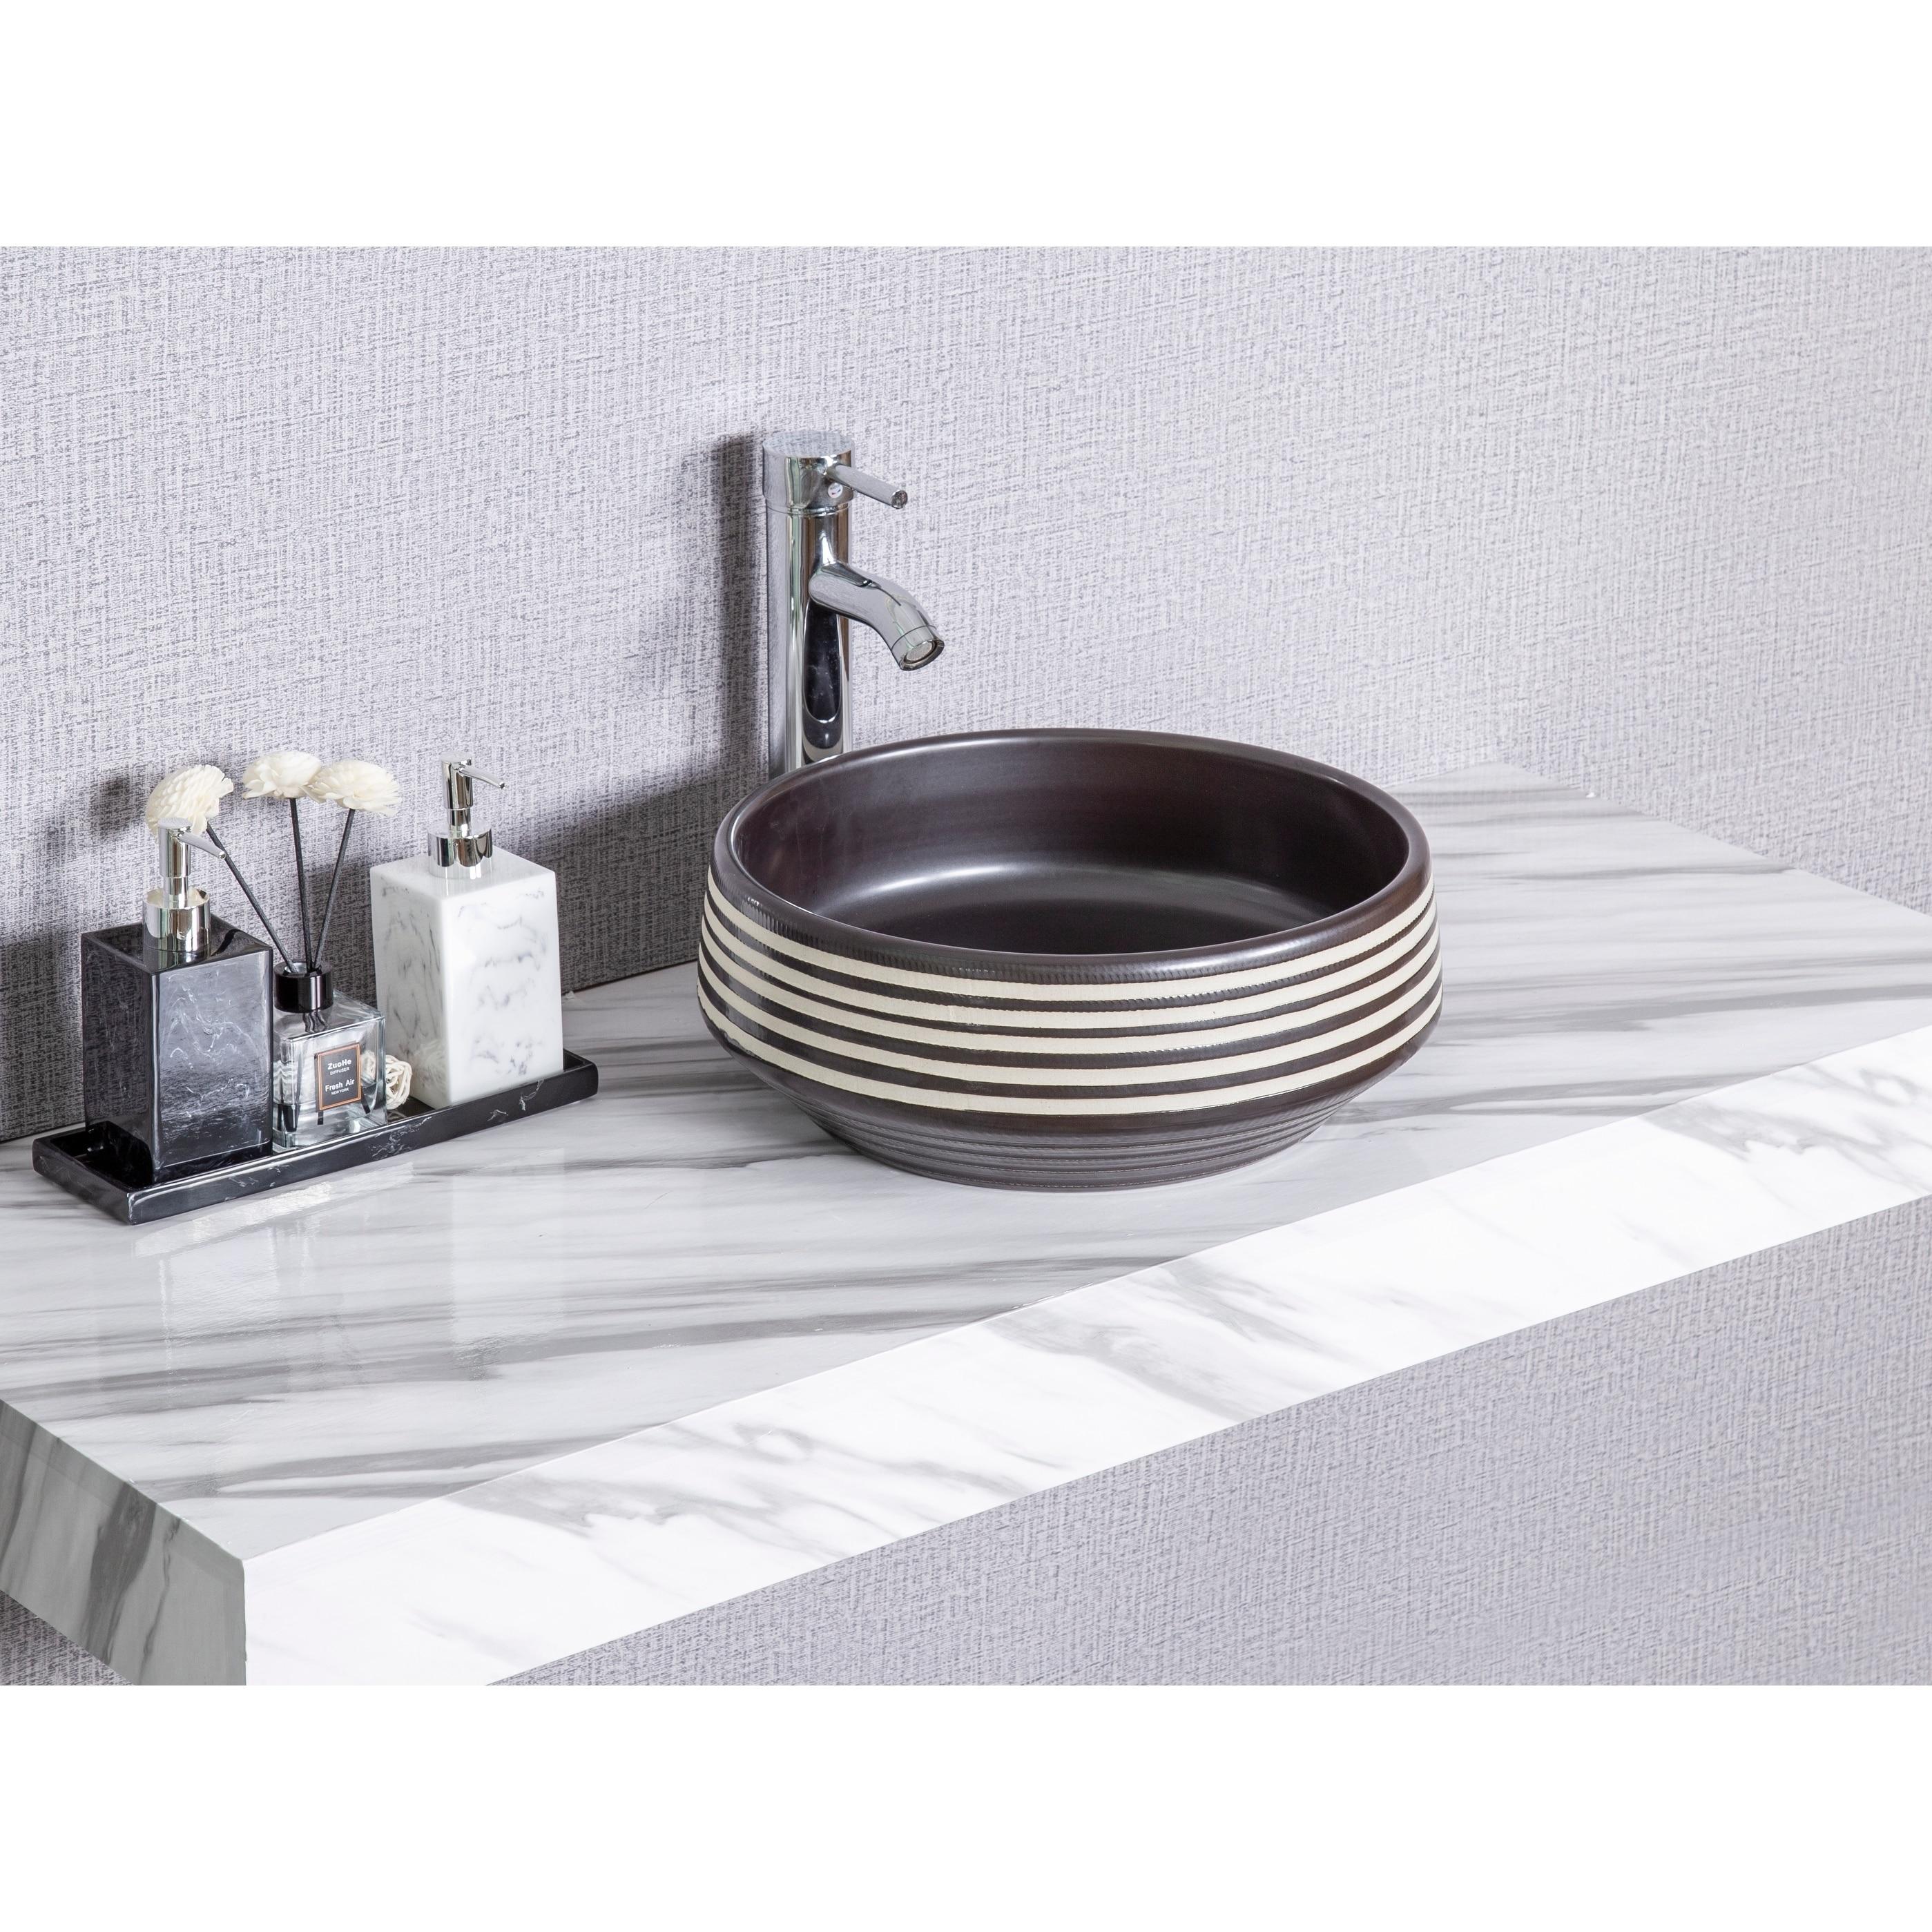 Cb Home Modern Strips Pattern Design Ceramic Basin Round Vessel Sink On Sale Overstock 30717004